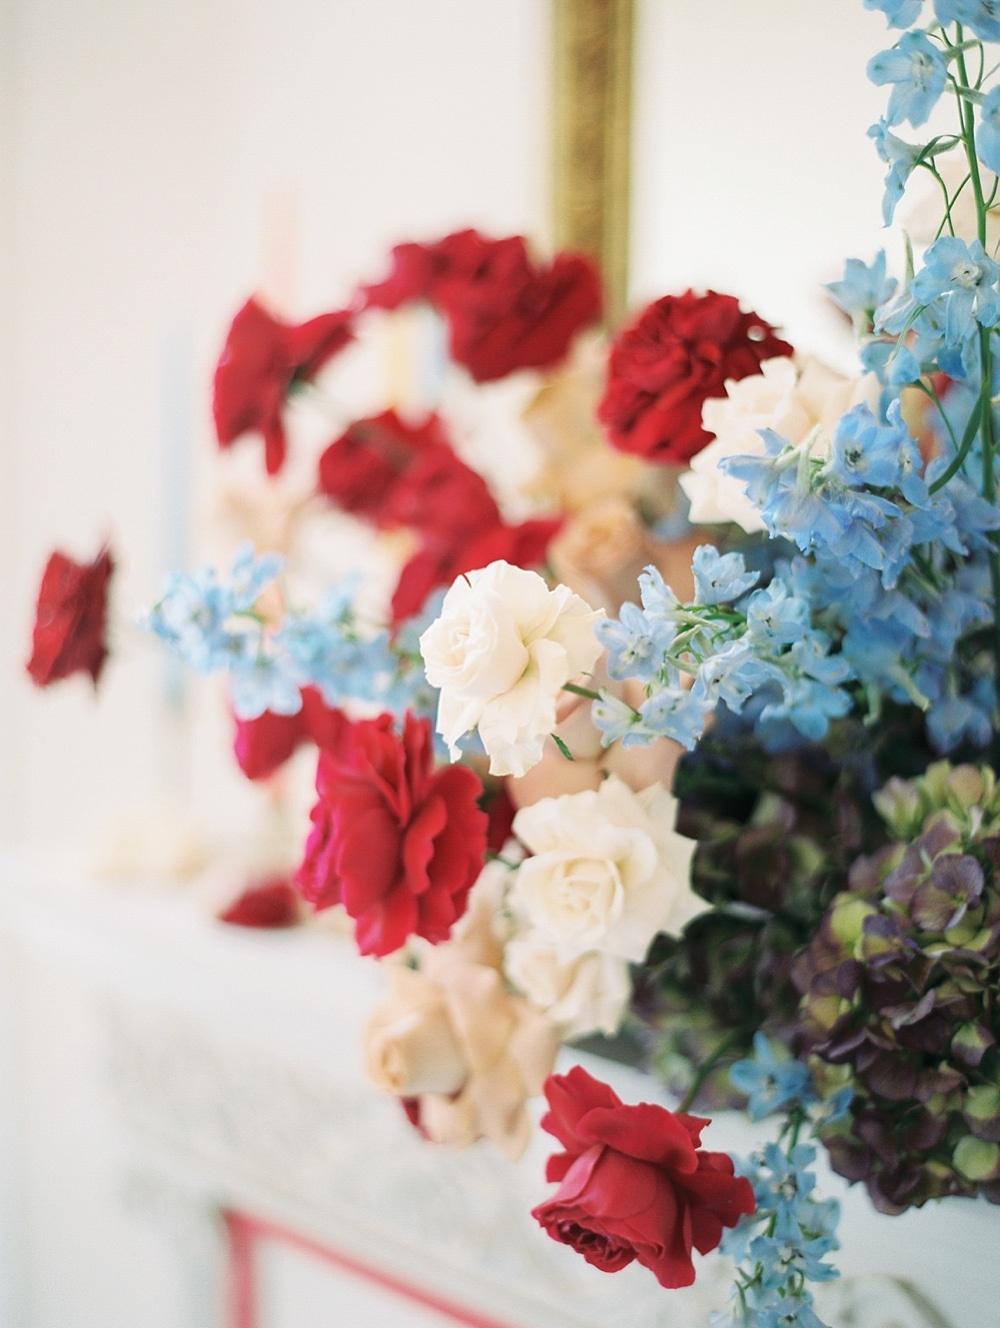 kristin-la-voie-photography-austin-wedding-photographer-woodbine-mansion-47